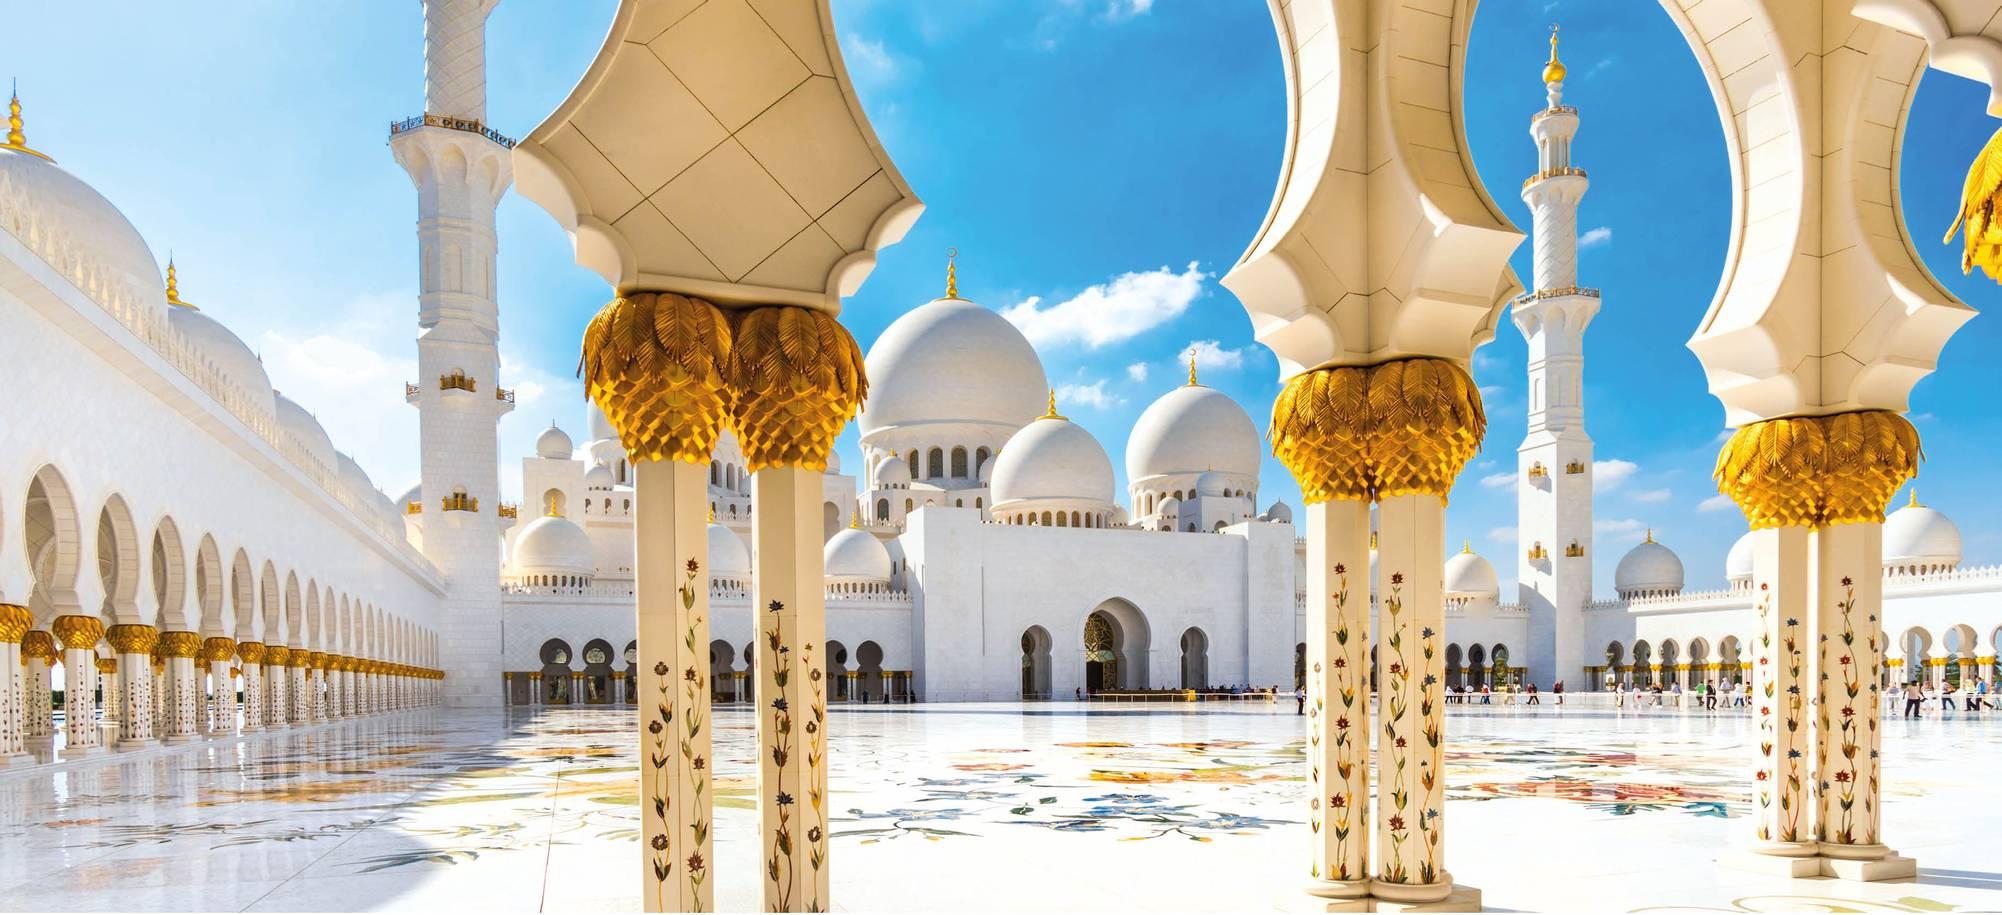 Web_Image_Abu Dhabi.jpg